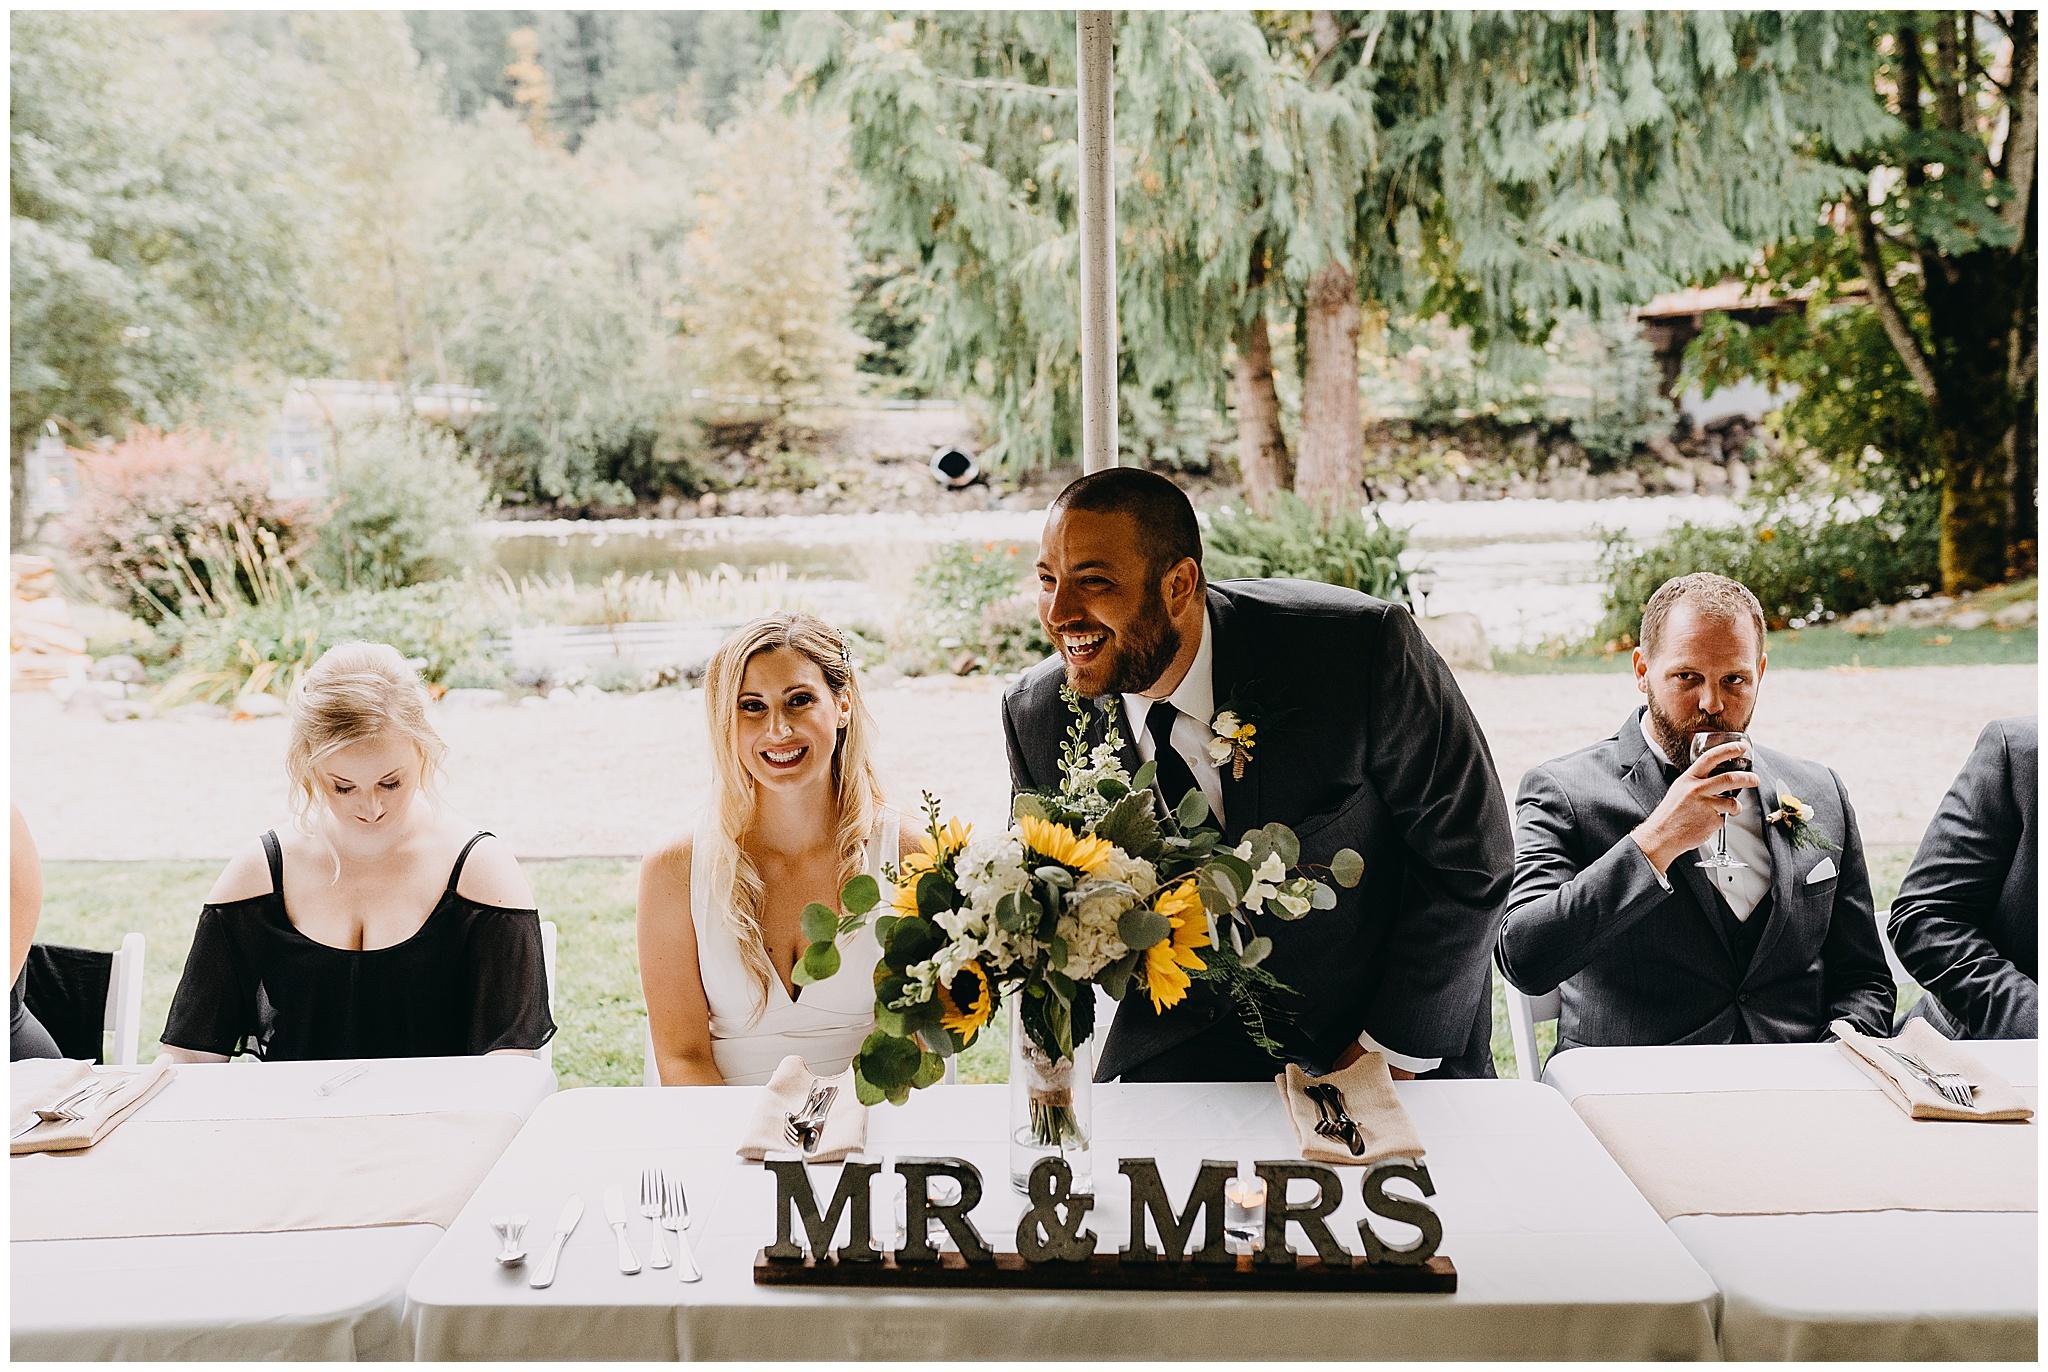 index-wa-wedding62.jpg